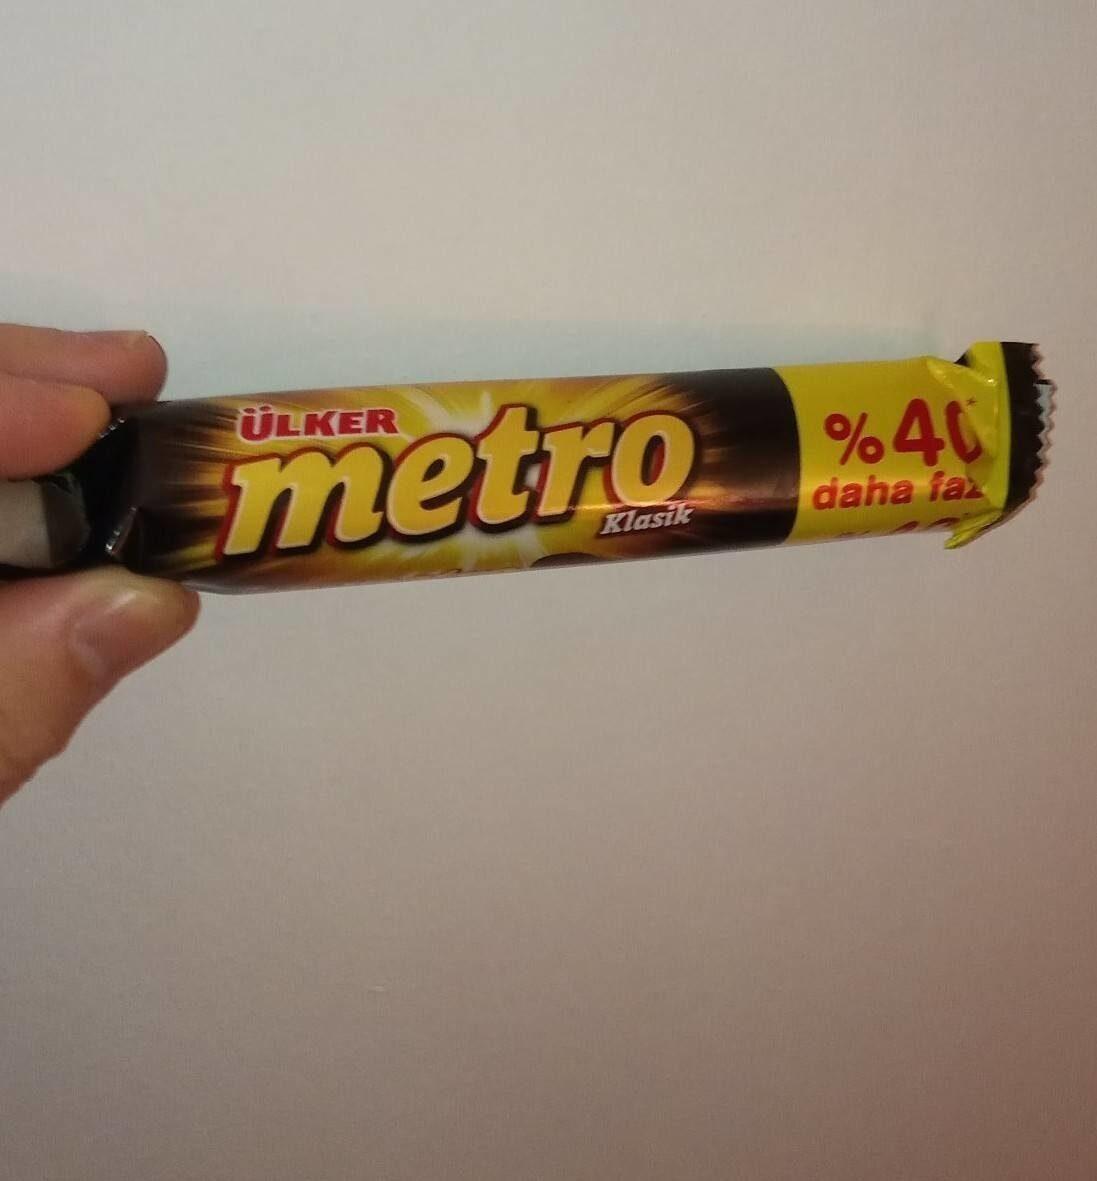 metro klasik - Product - tr